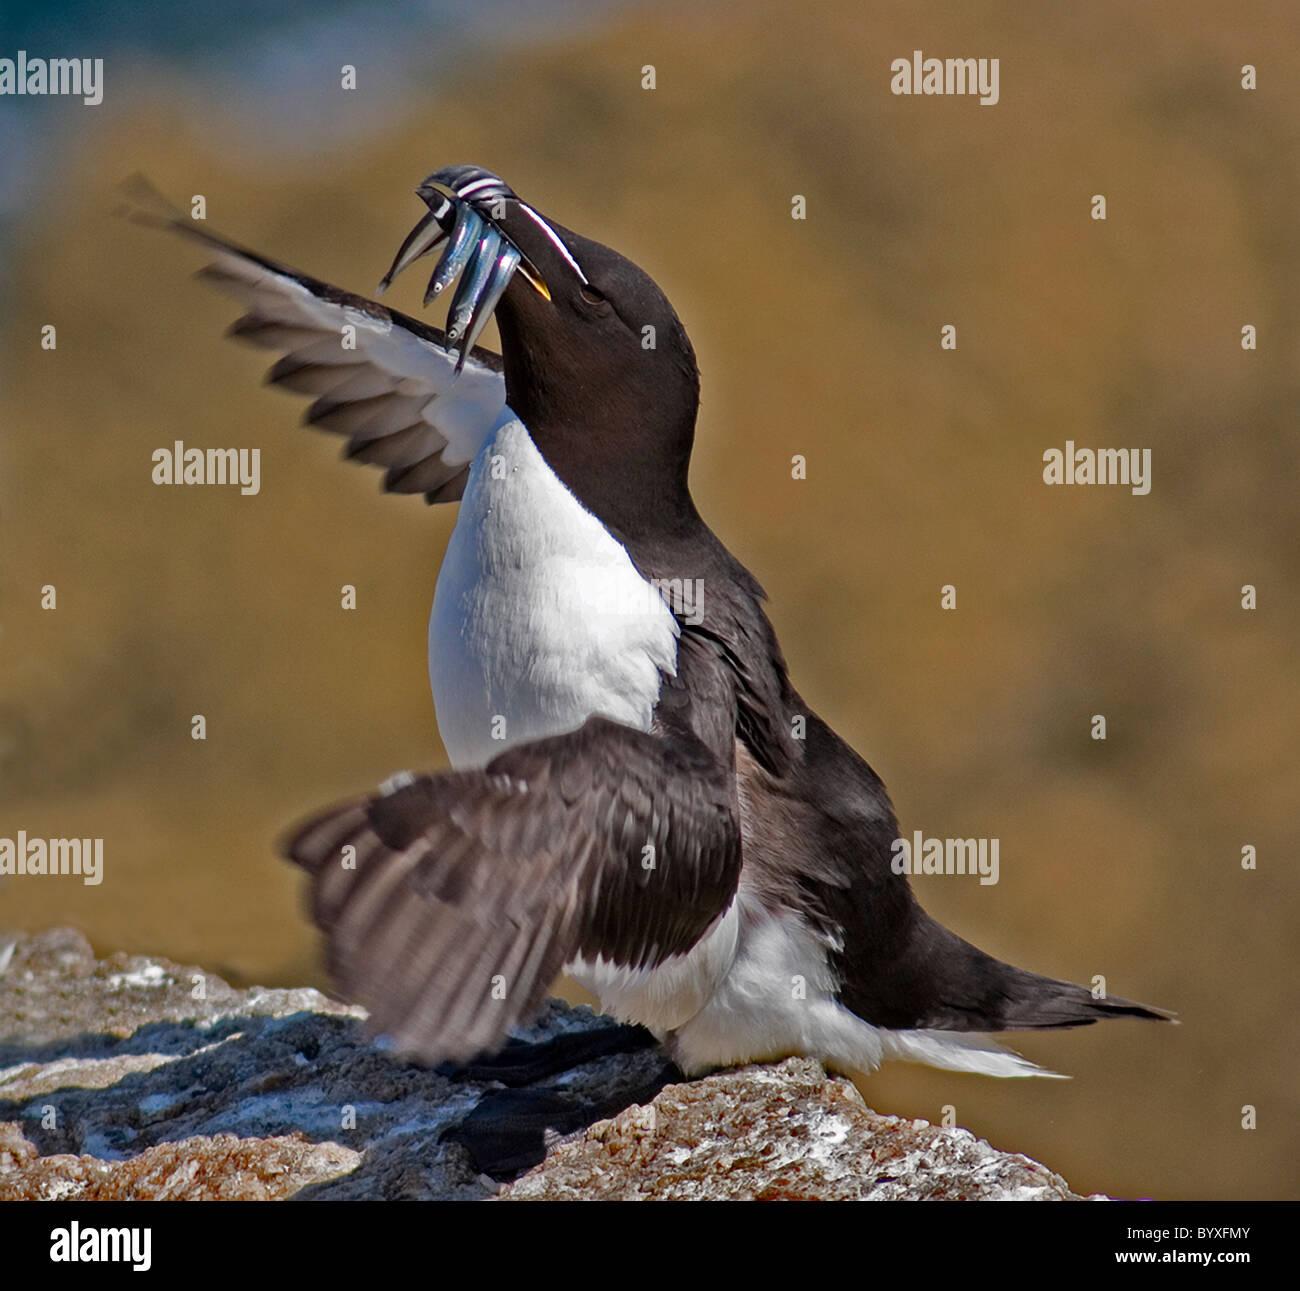 Razorbill alca torda Lundy island Bristol Channel UK - Stock Image